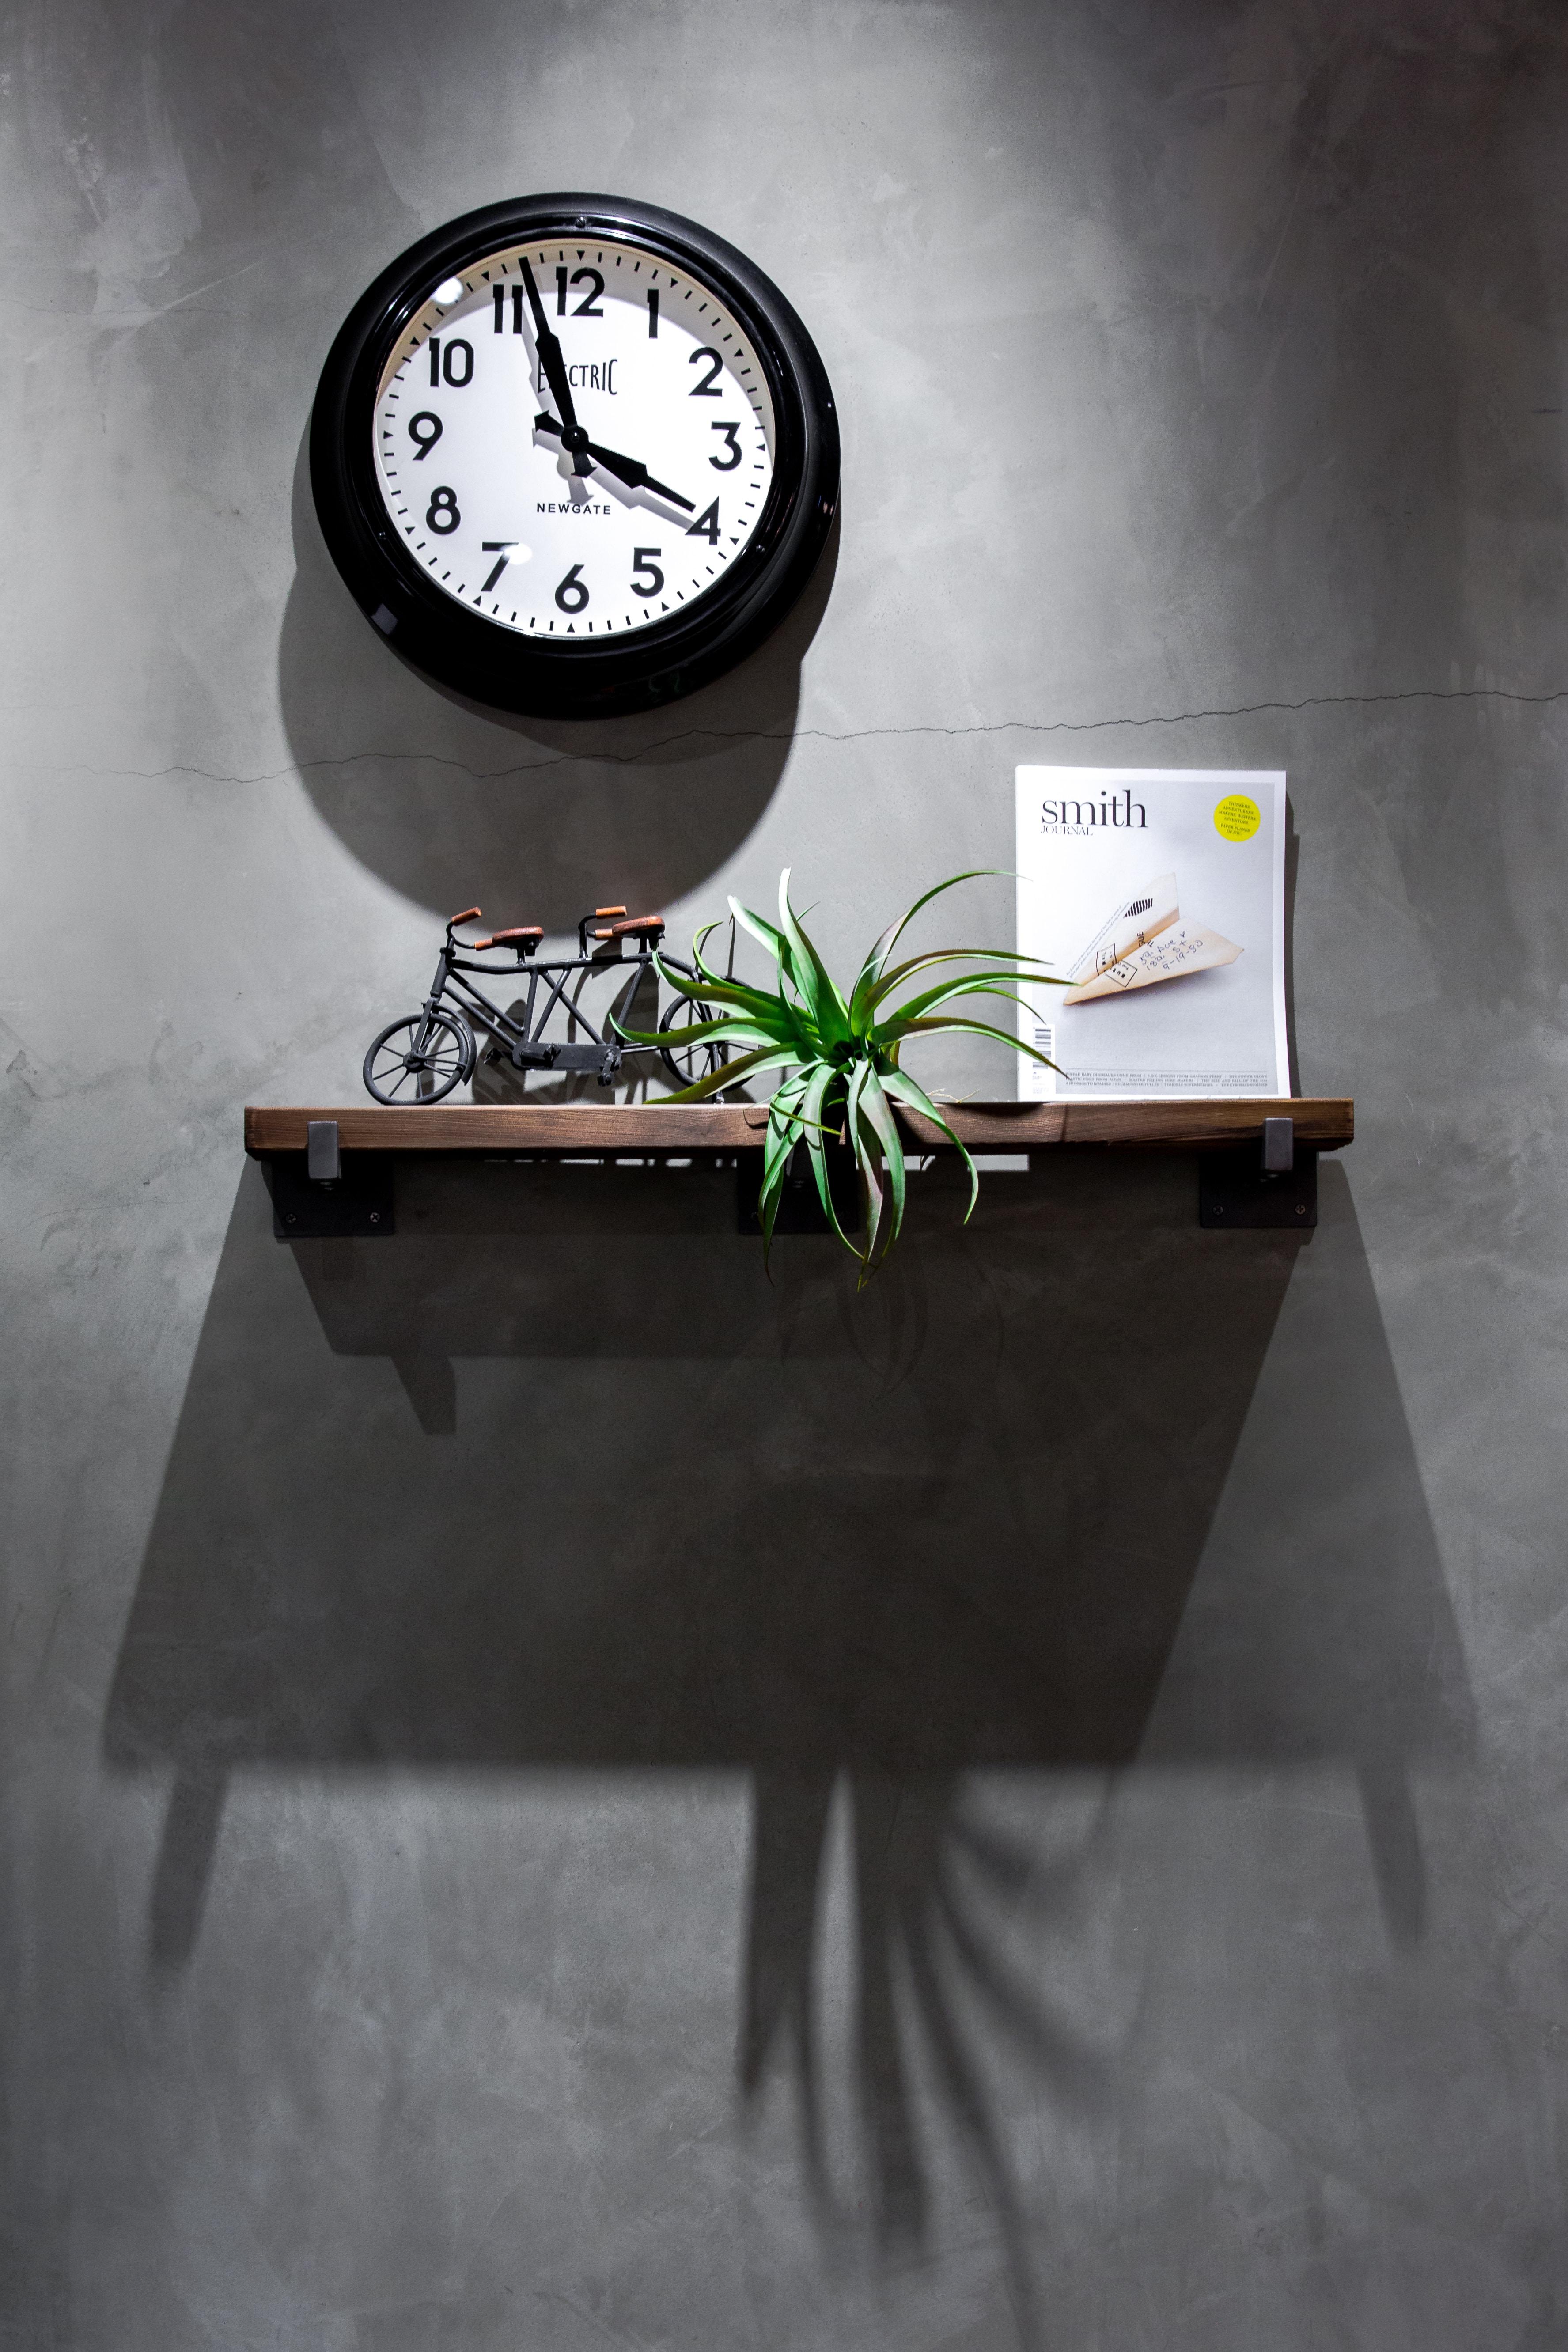 black and white analog wall clock displaying 3:58